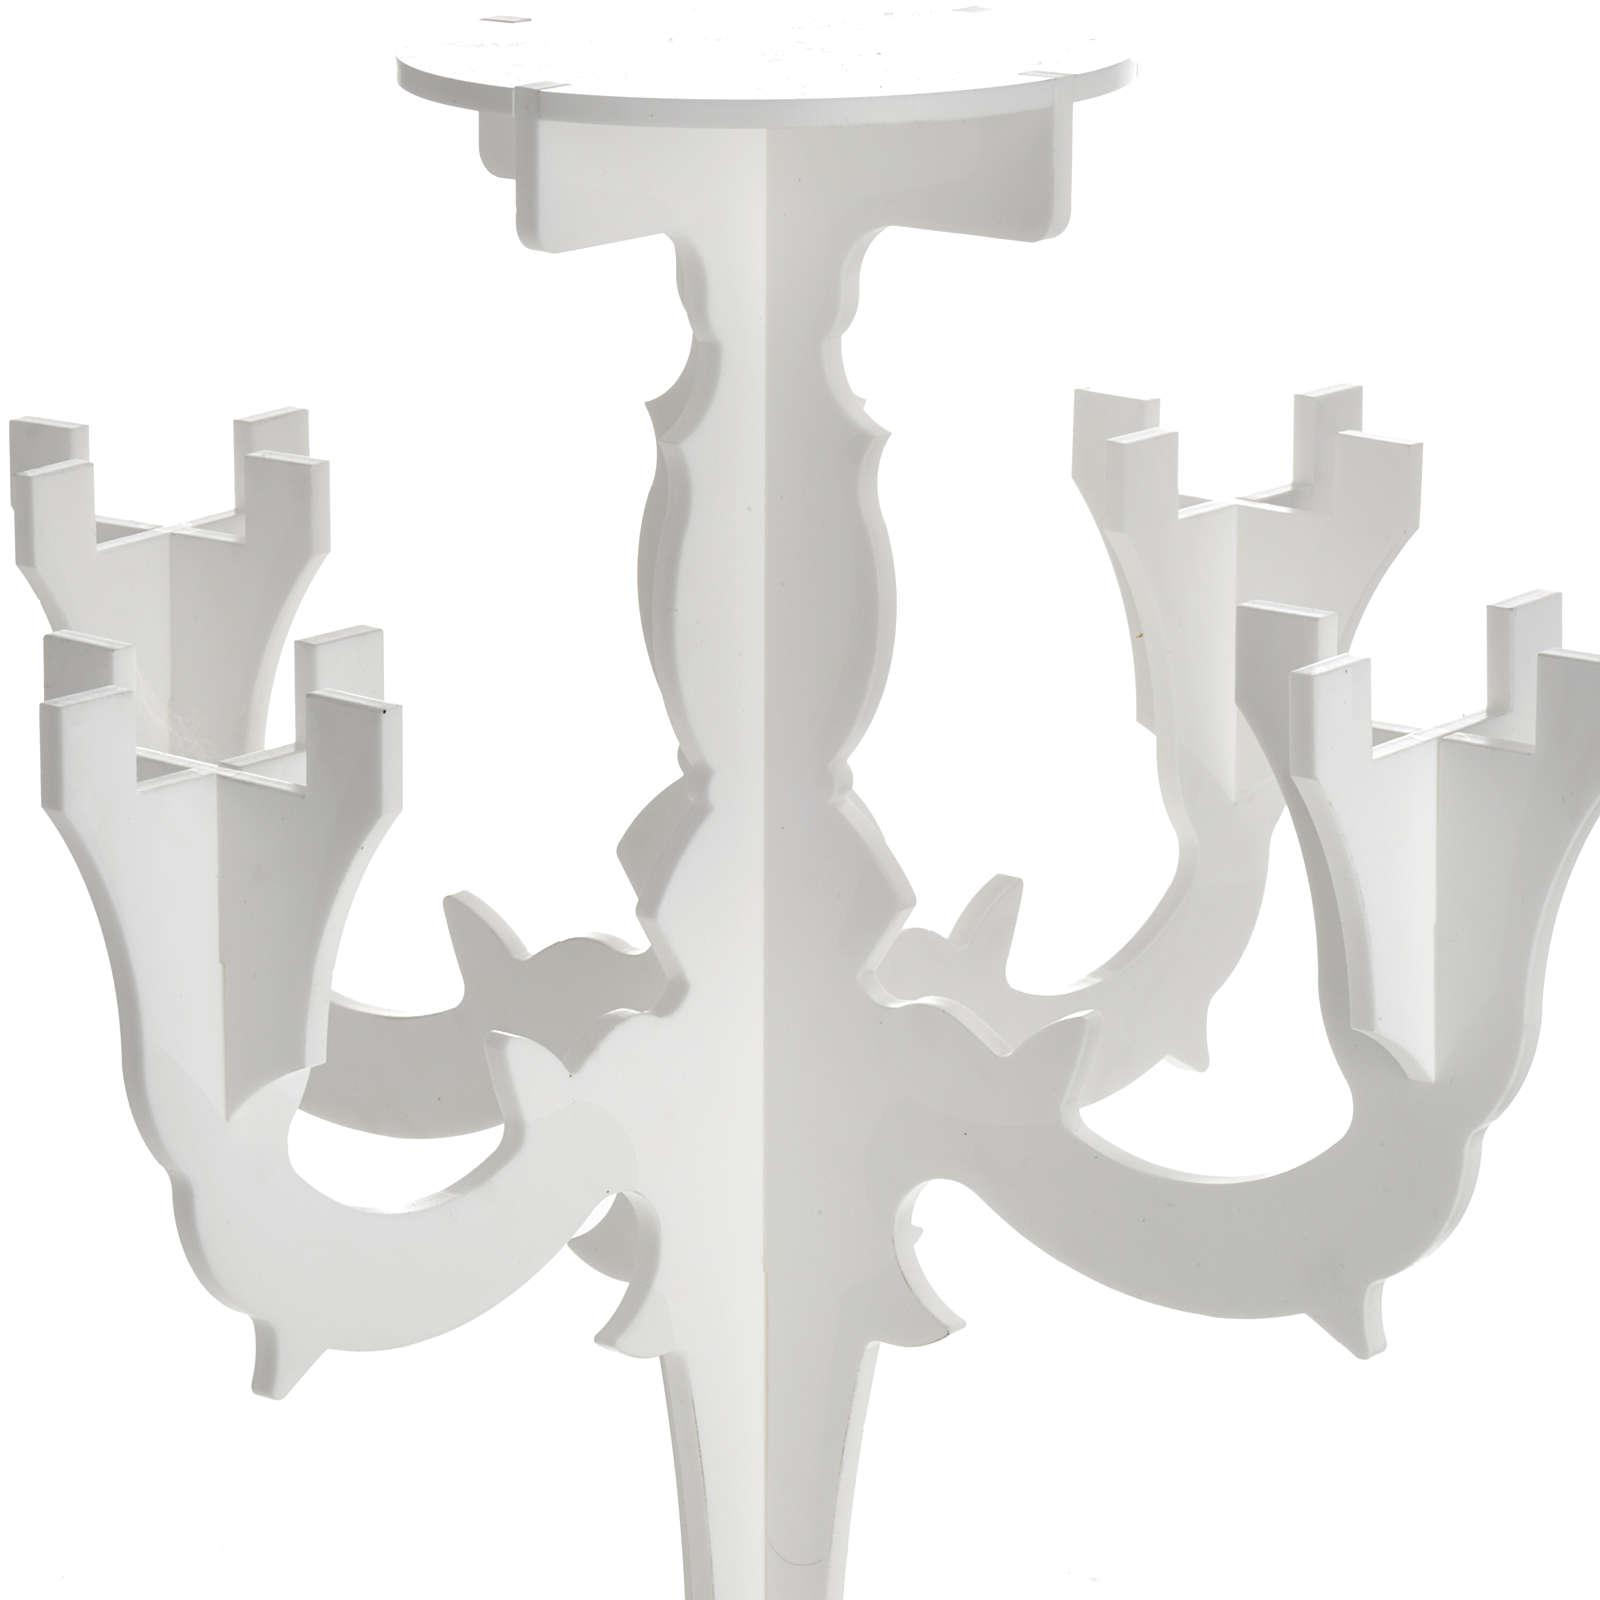 Candelabro in plexiglass bianco 5 fiamme 4